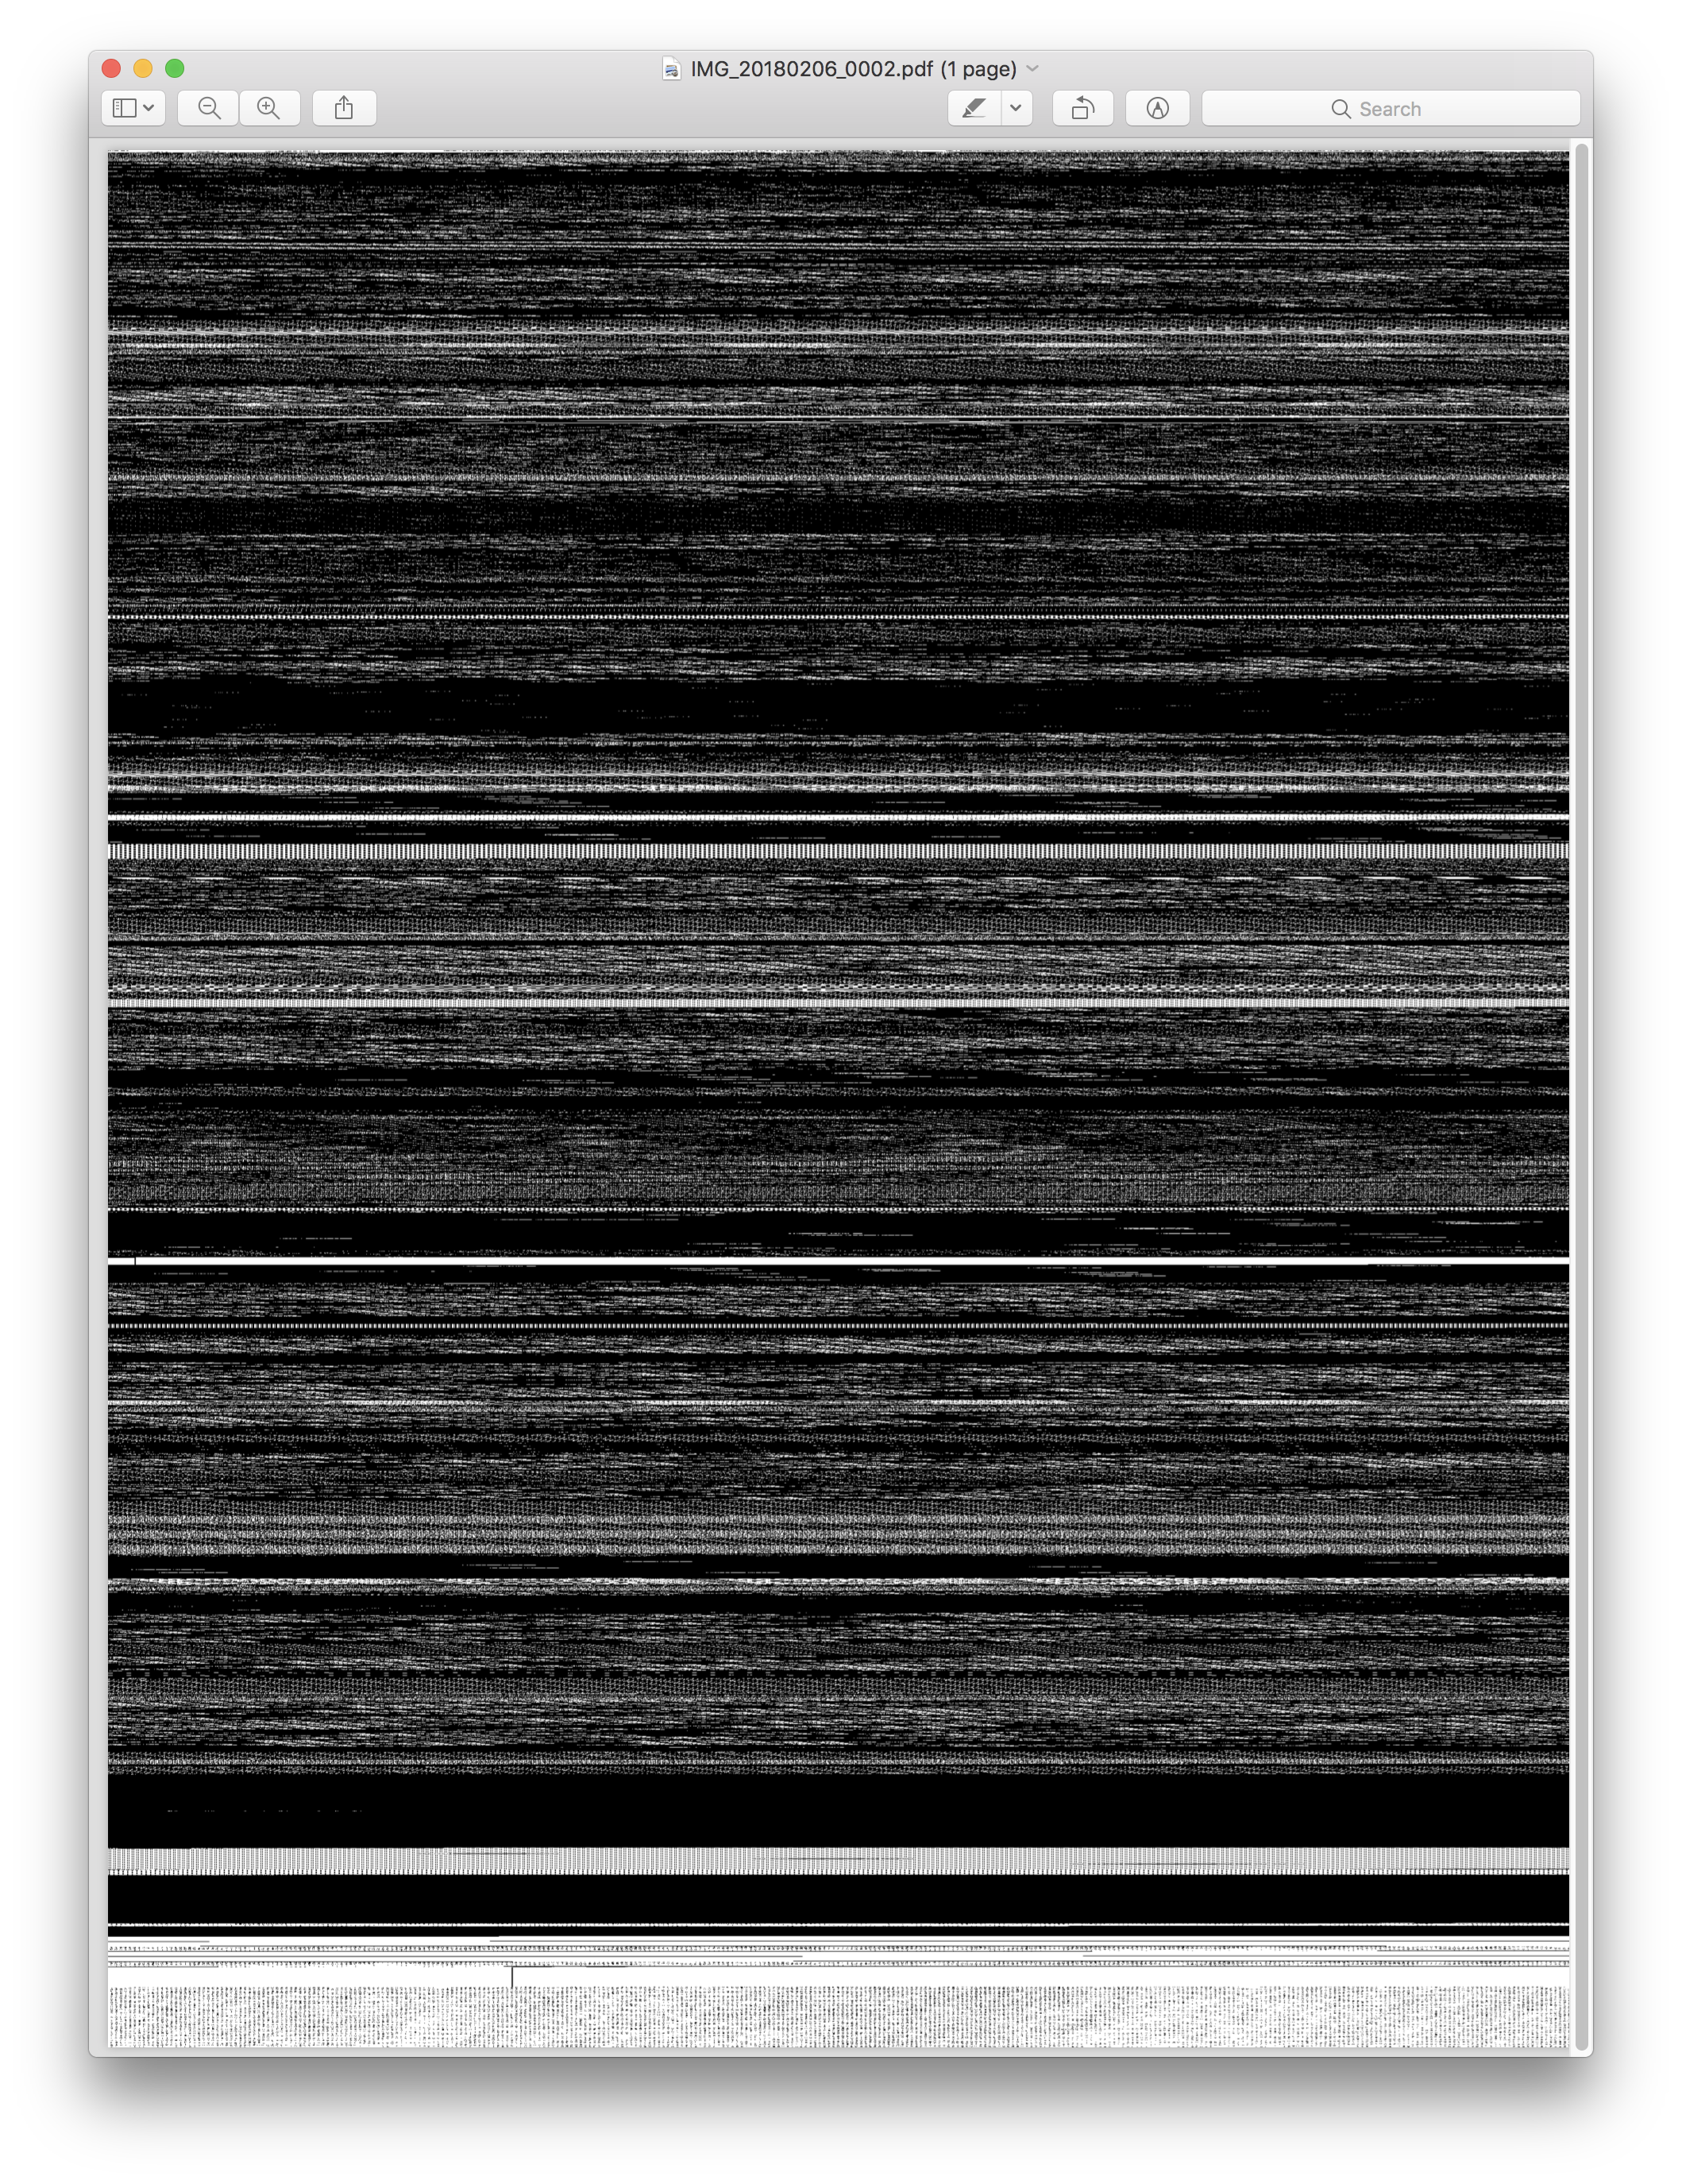 Screenshot 2018-02-06 11.02.09.png